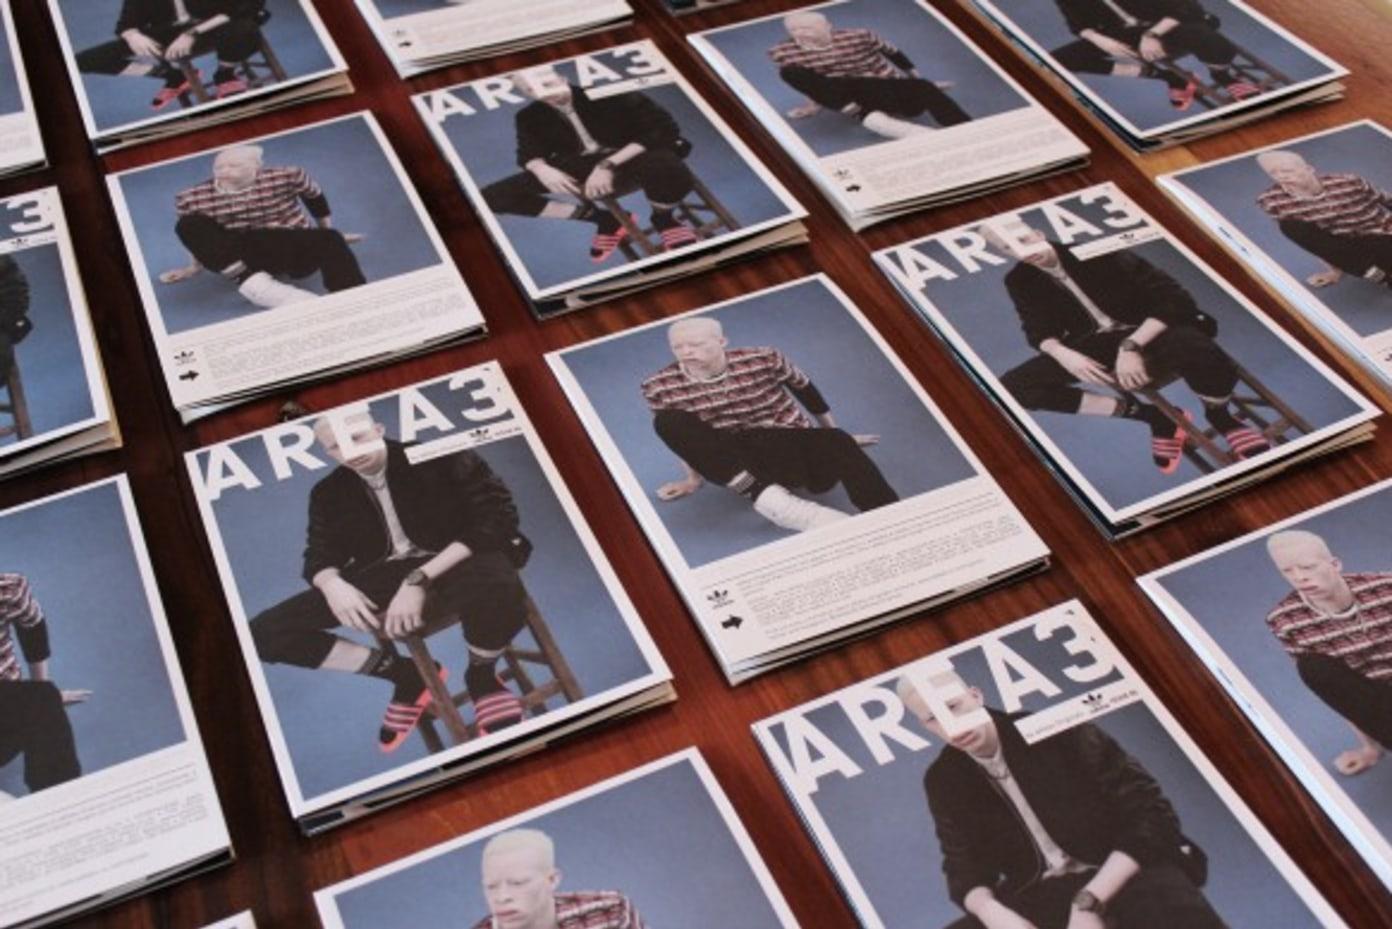 adidas Originals AREA3 Broadsheet Issue 5 Available at Shelflife